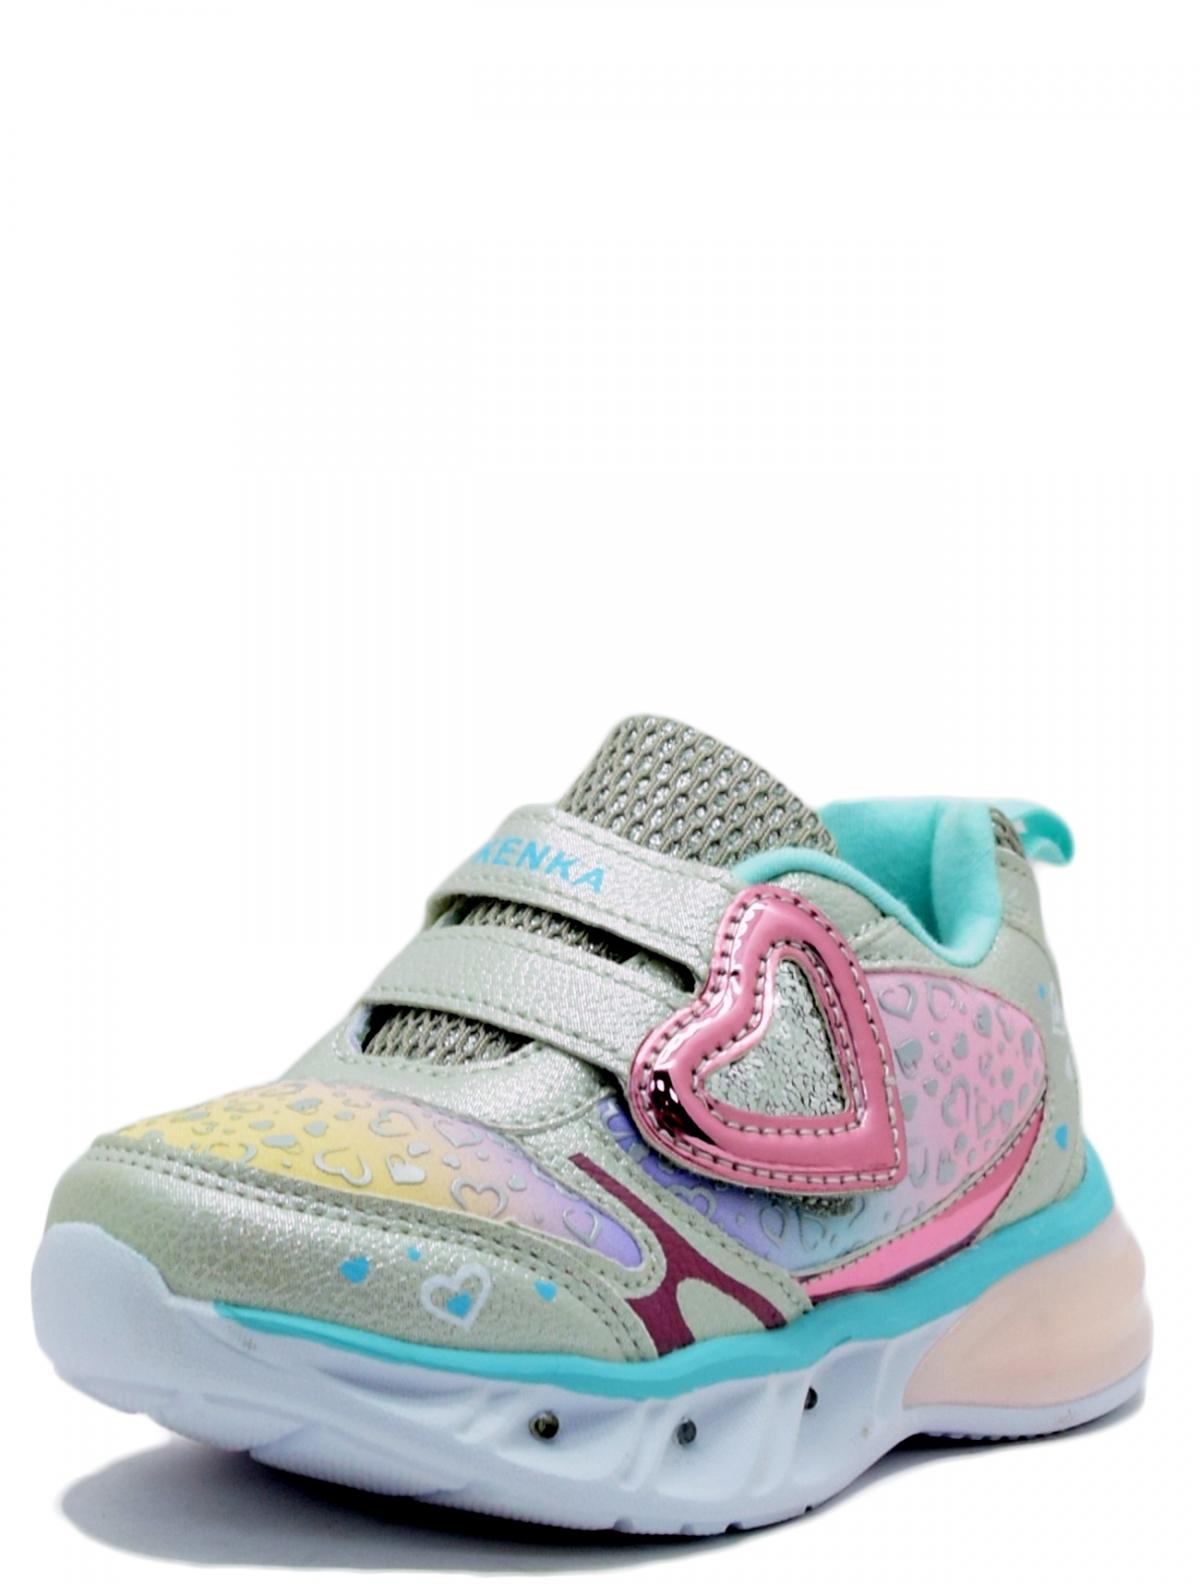 Kenka KNM-2052 детские кроссовки